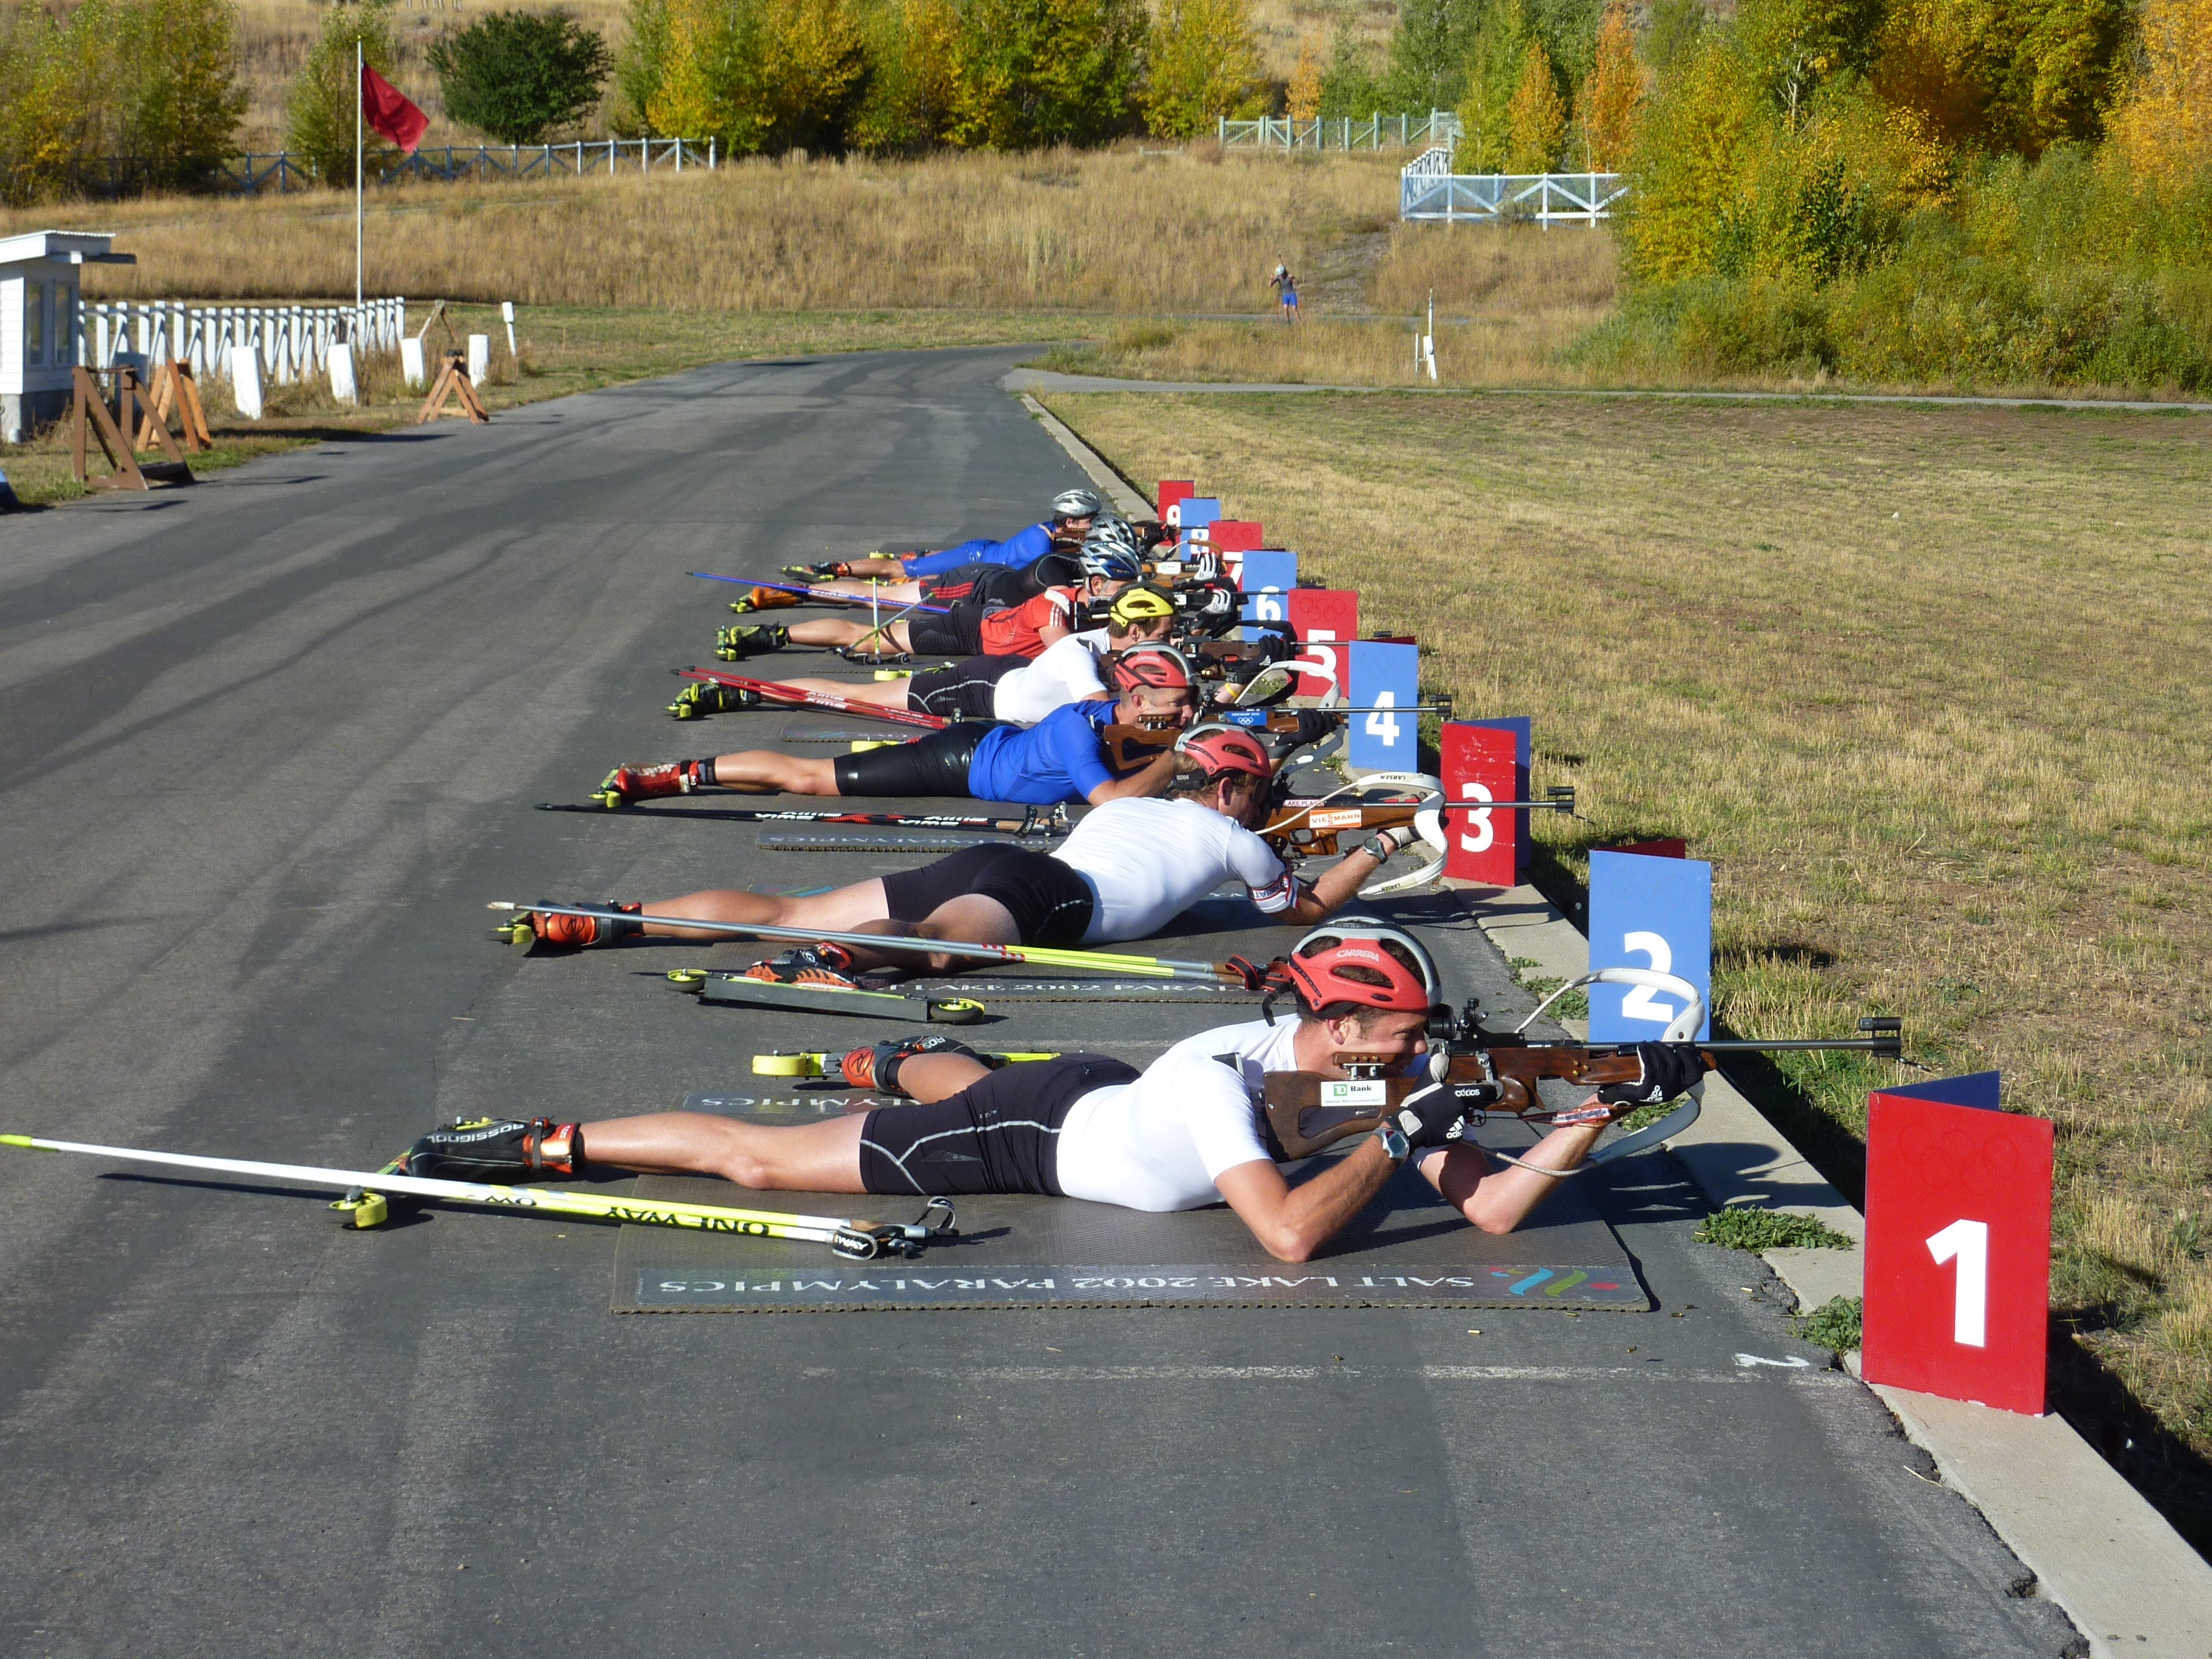 https://fasterskier.com/wp-content/blogs.dir/1/files/2010/10/biathlonmen.jpg